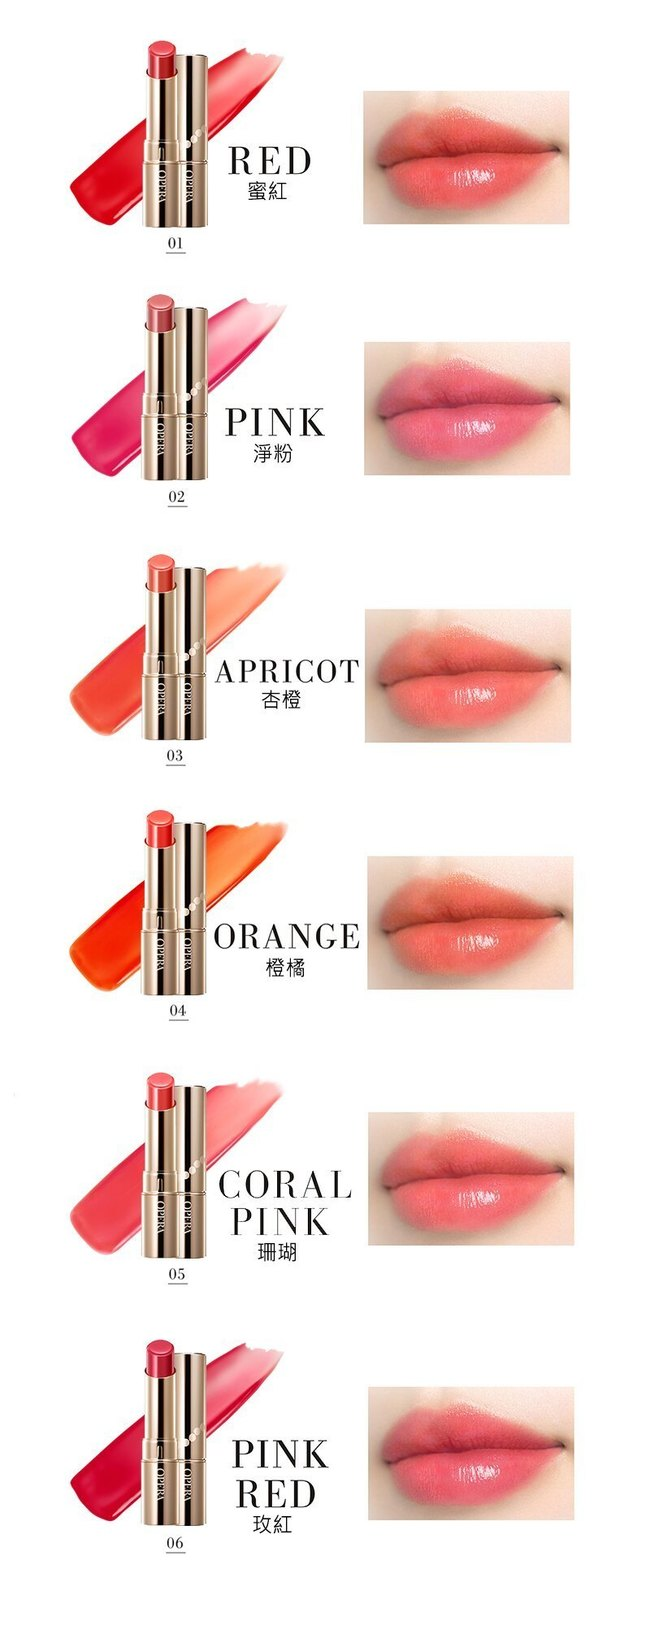 「opera 唇膏」的圖片搜尋結果